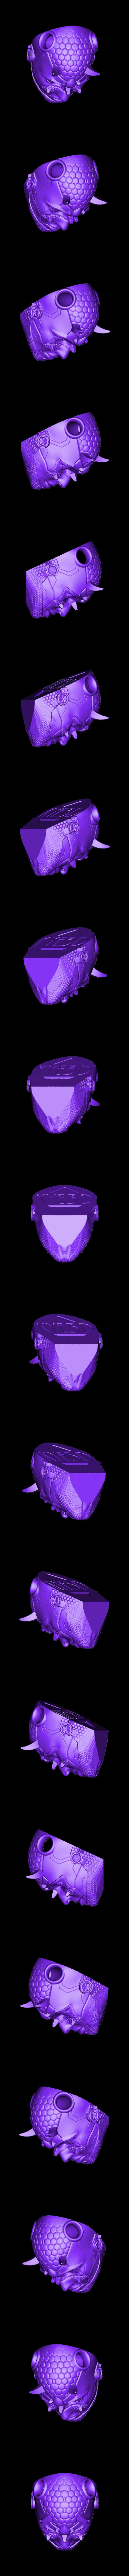 Onyx_Pendant.stl Download free STL file Onyx VR Pendant  • 3D printable design, KYE3D